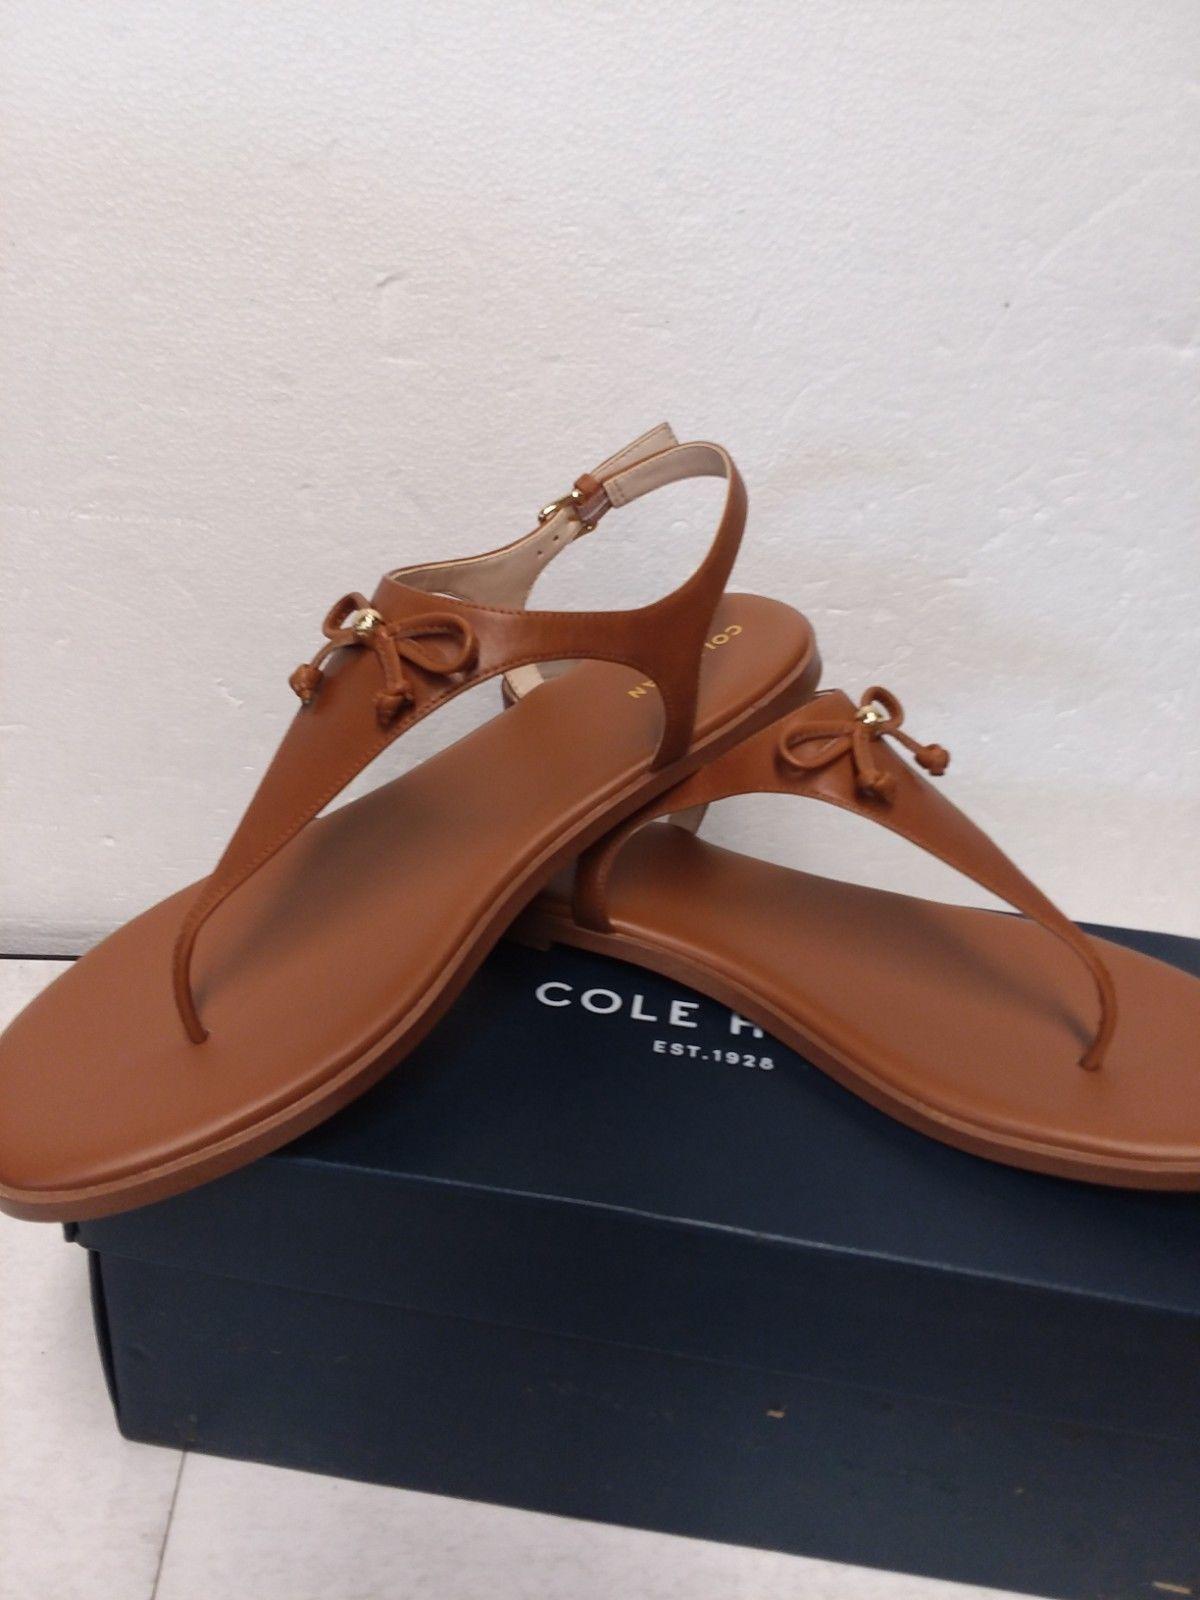 Cole Haan Women's FINDRA Leather Thong Sandal II Flat - Tan 10 B